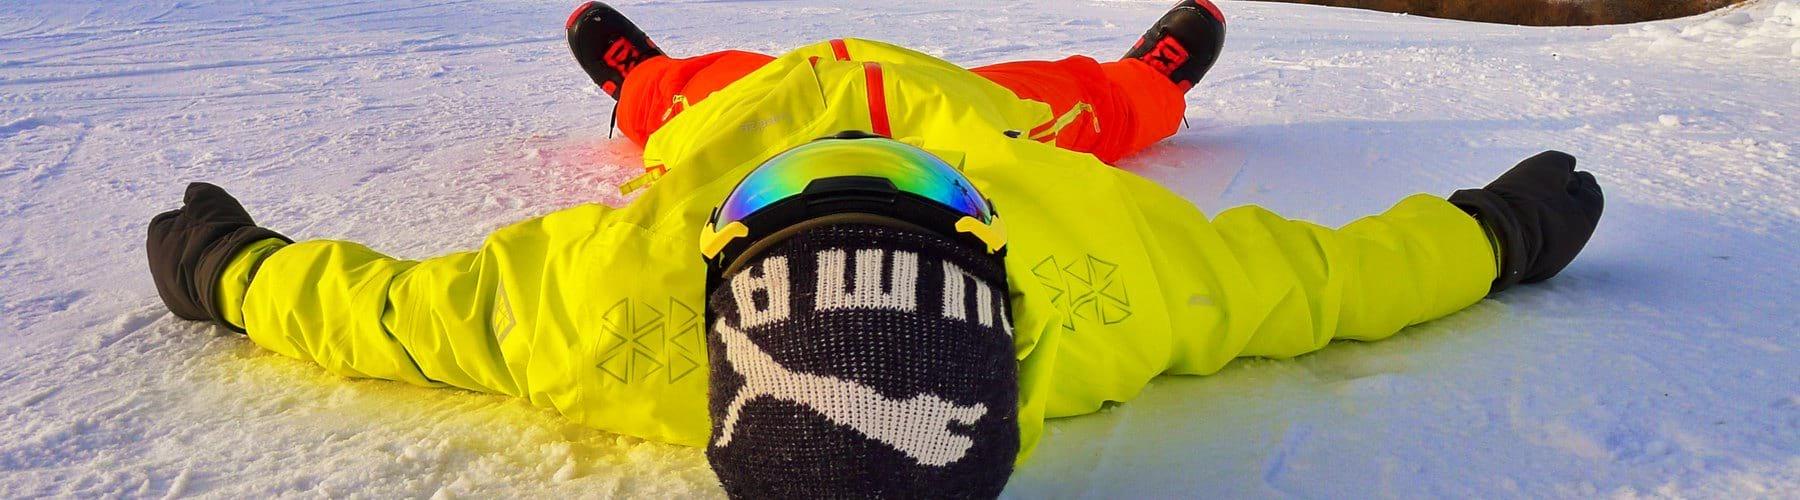 Neon Ski Suit